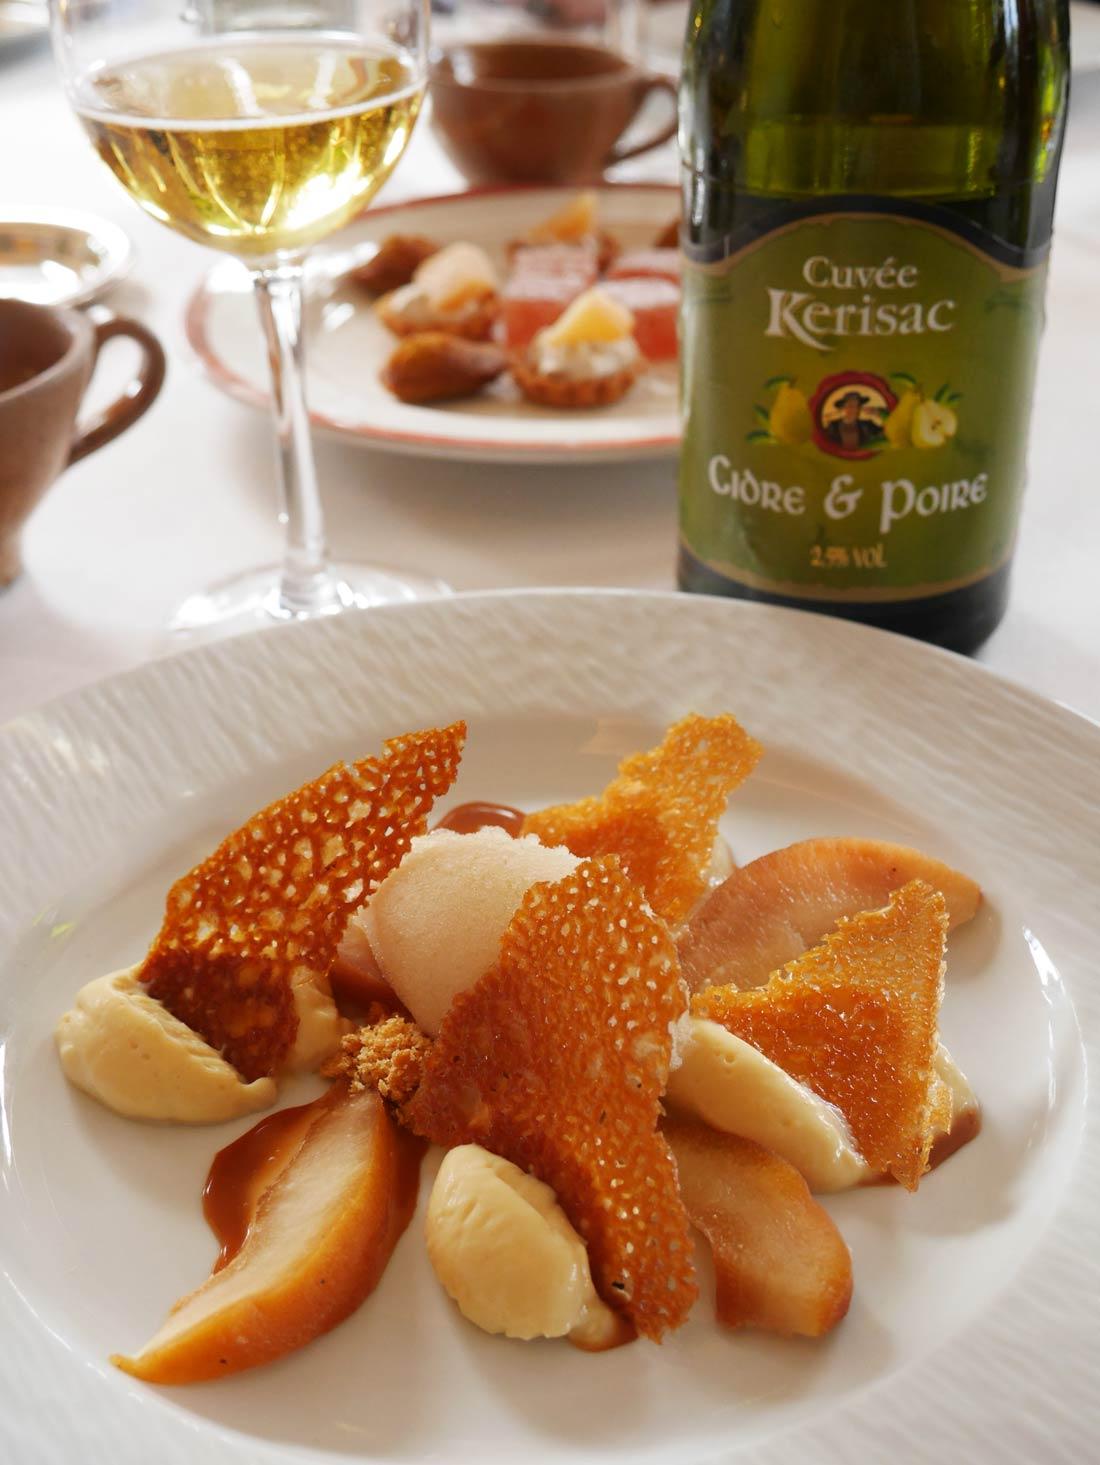 Dessert Kerisac poire